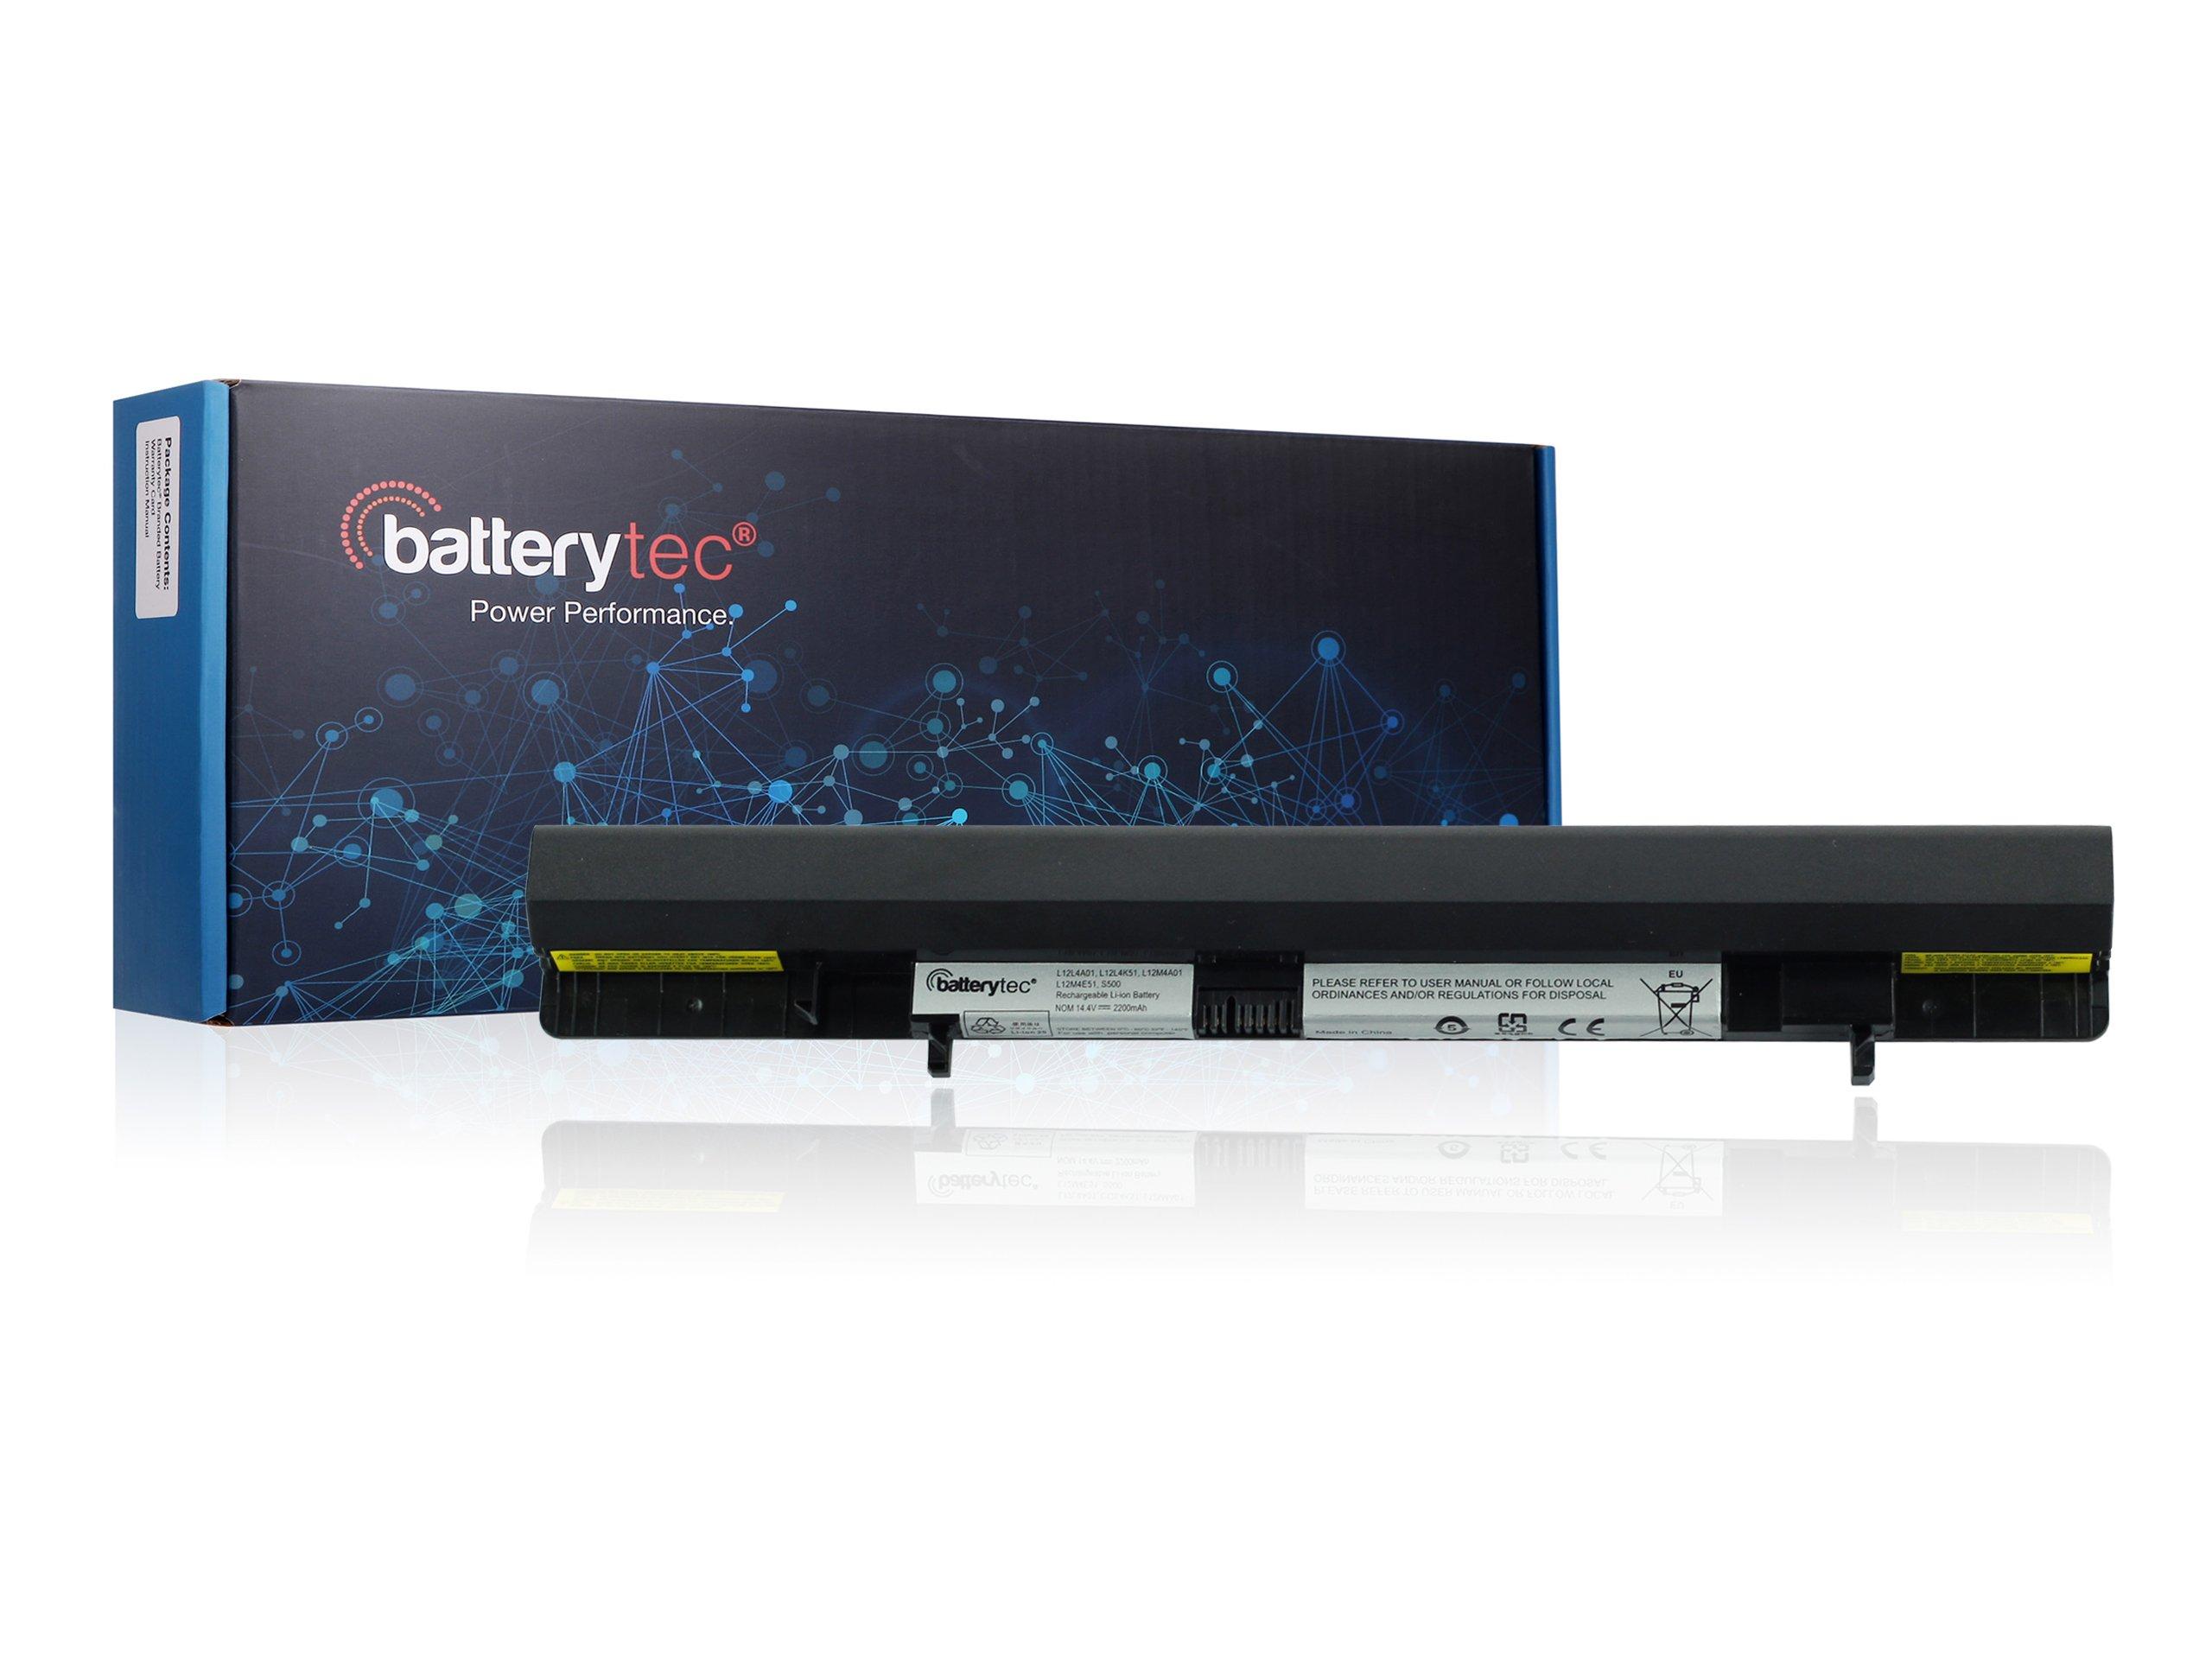 Bateria Para Lenovo Ideapad Flex 14d 14m 15d 15m Series S500 S500 Touch Series 15ap 14at L12l4a01 L12l4k51 L12m4a01 L12m